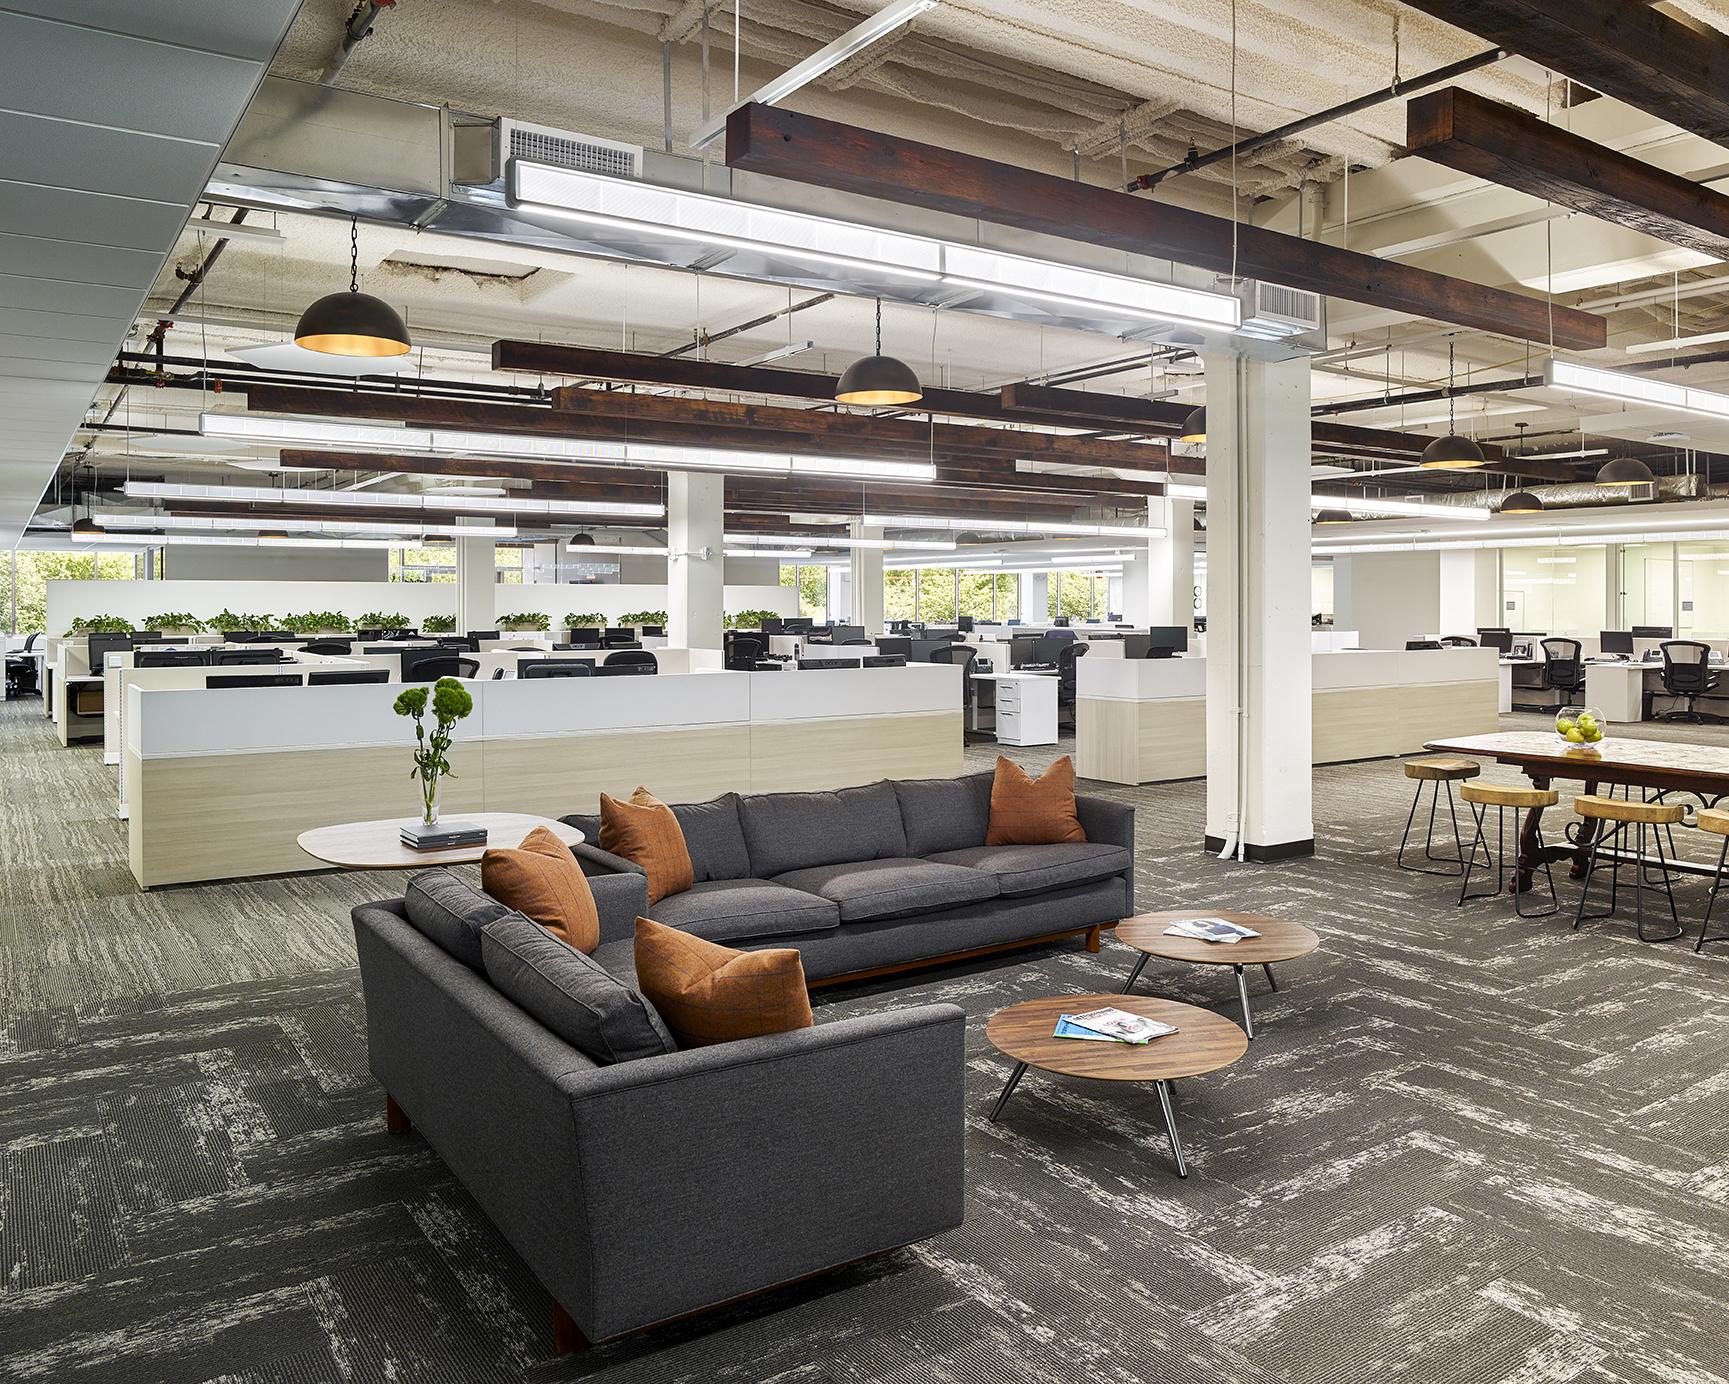 DFC Break Area/Open Working Space